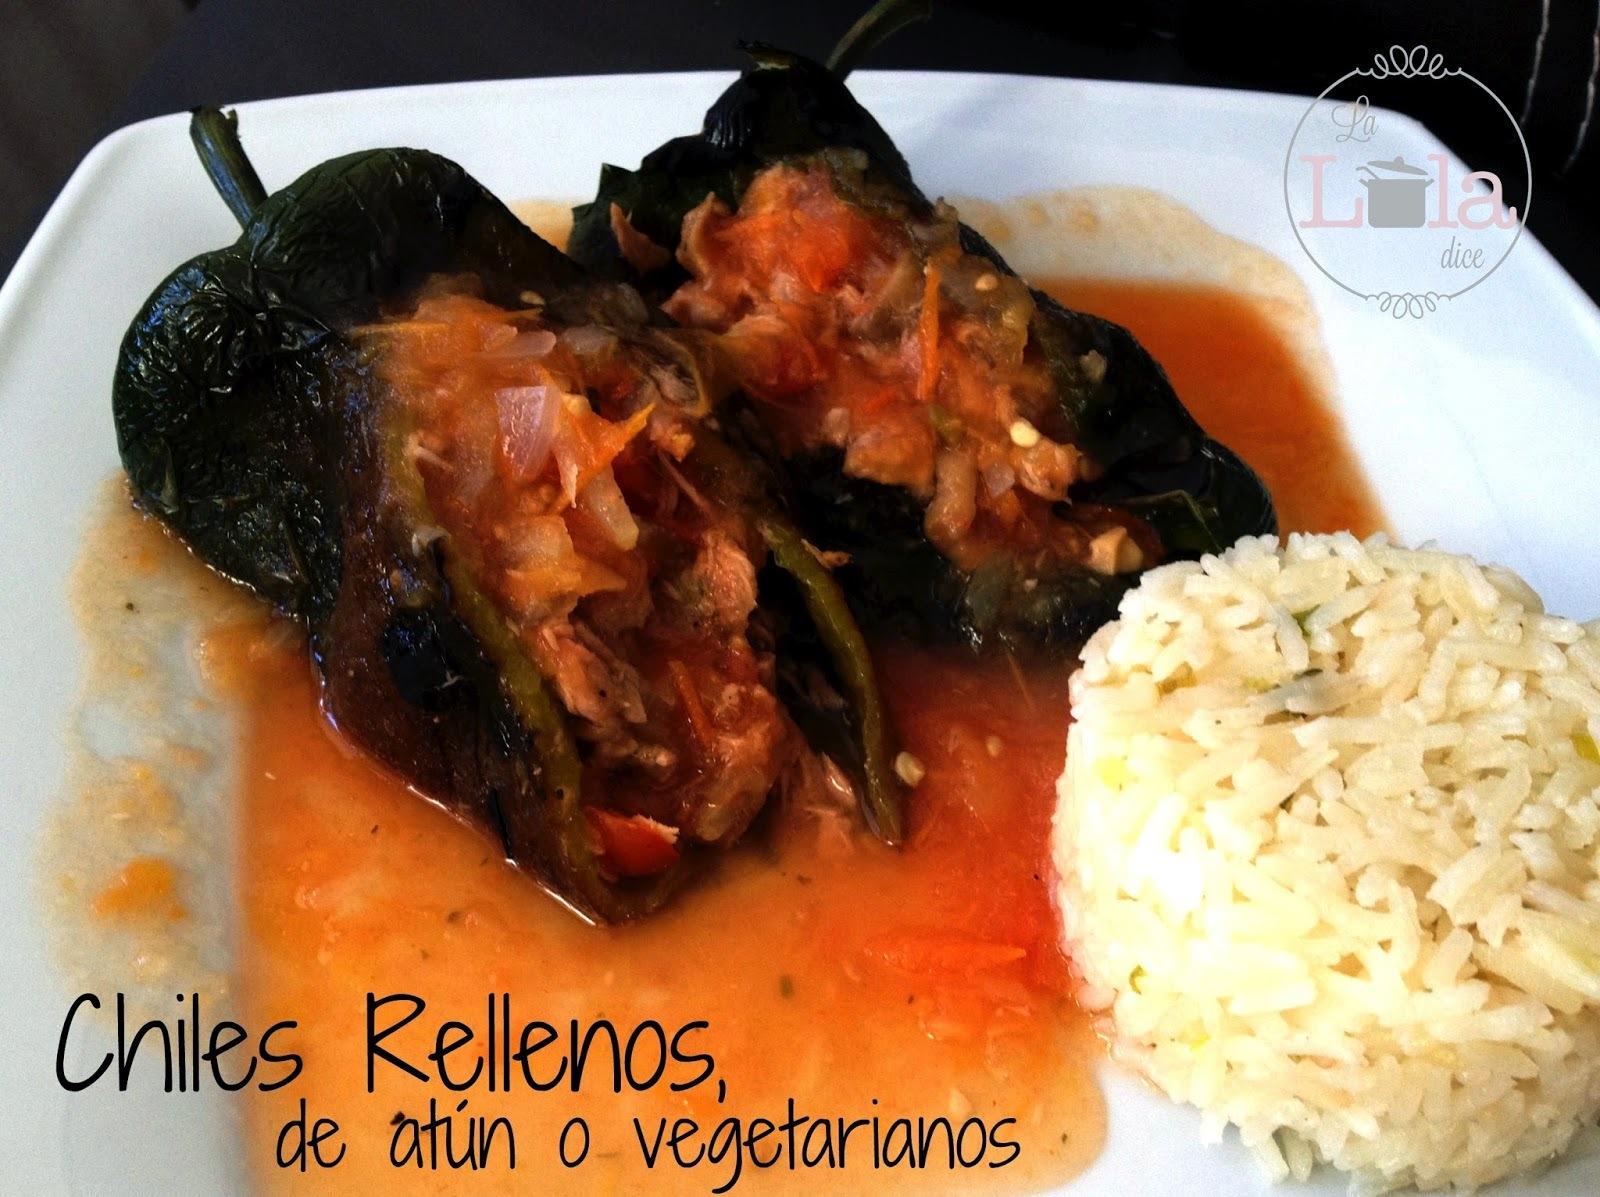 Chiles Rellenos, de atún o vegetarianos